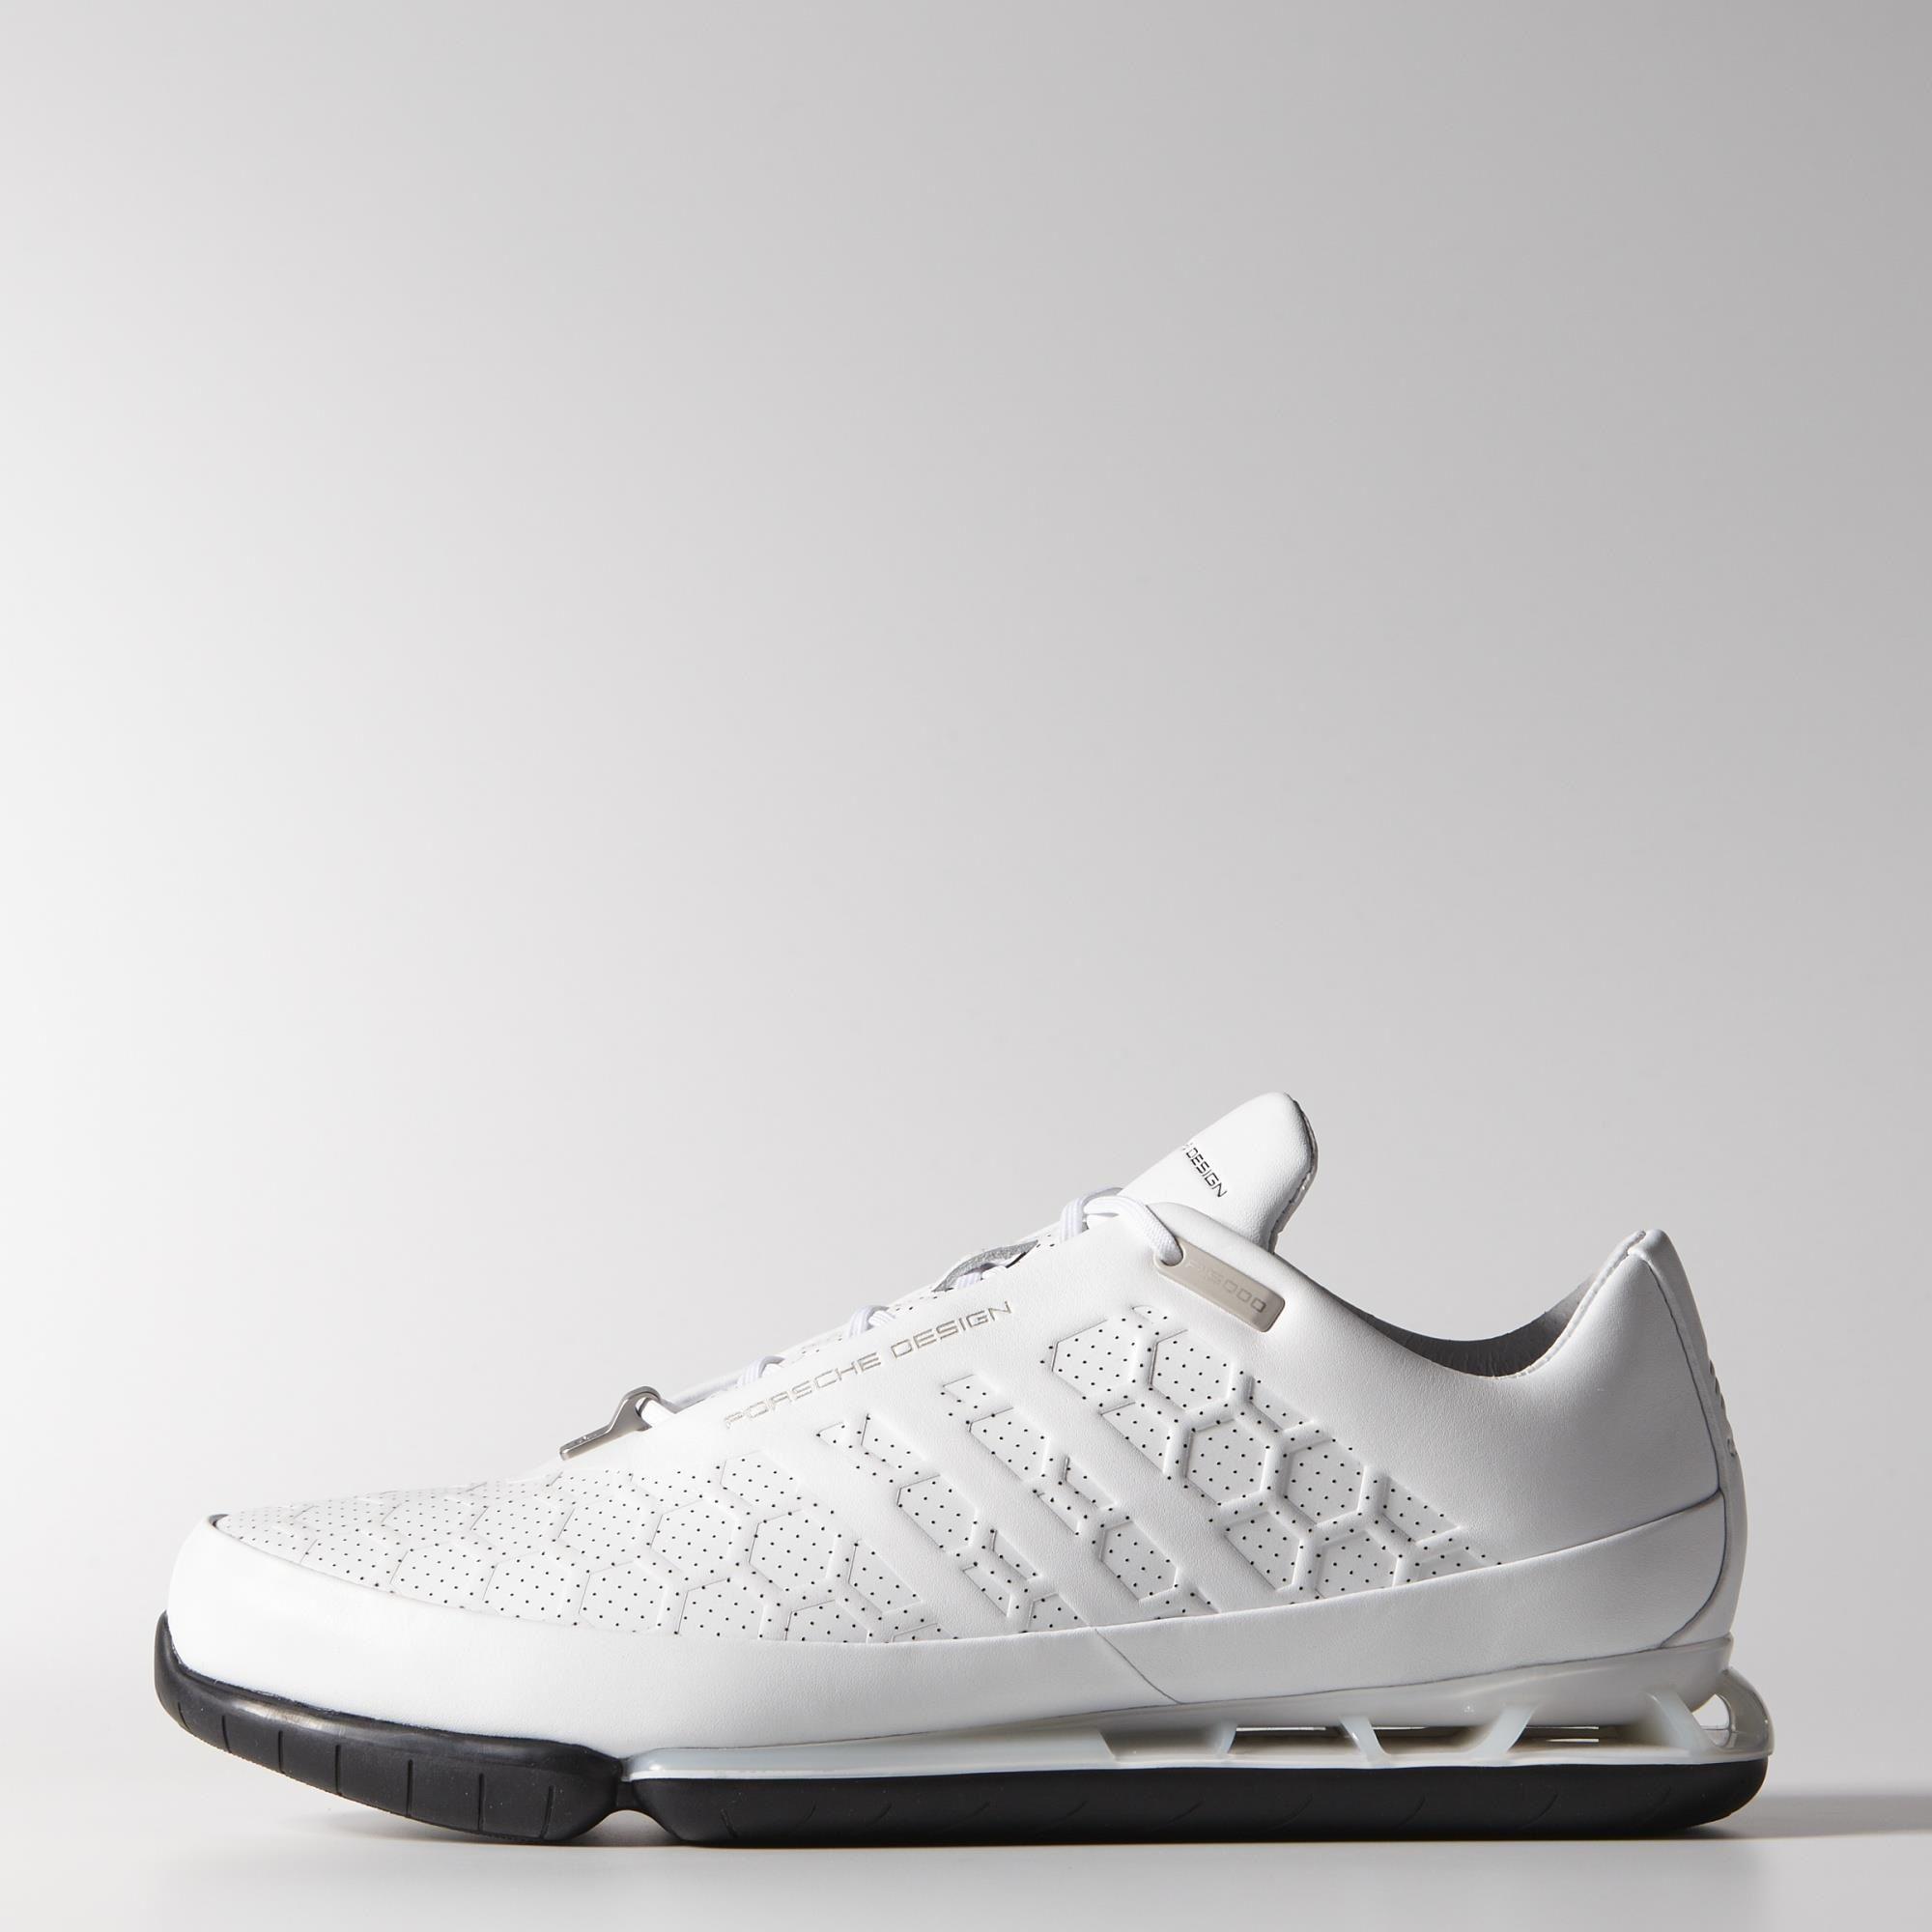 343e211b4 adidas Tubular Bounce Shoe